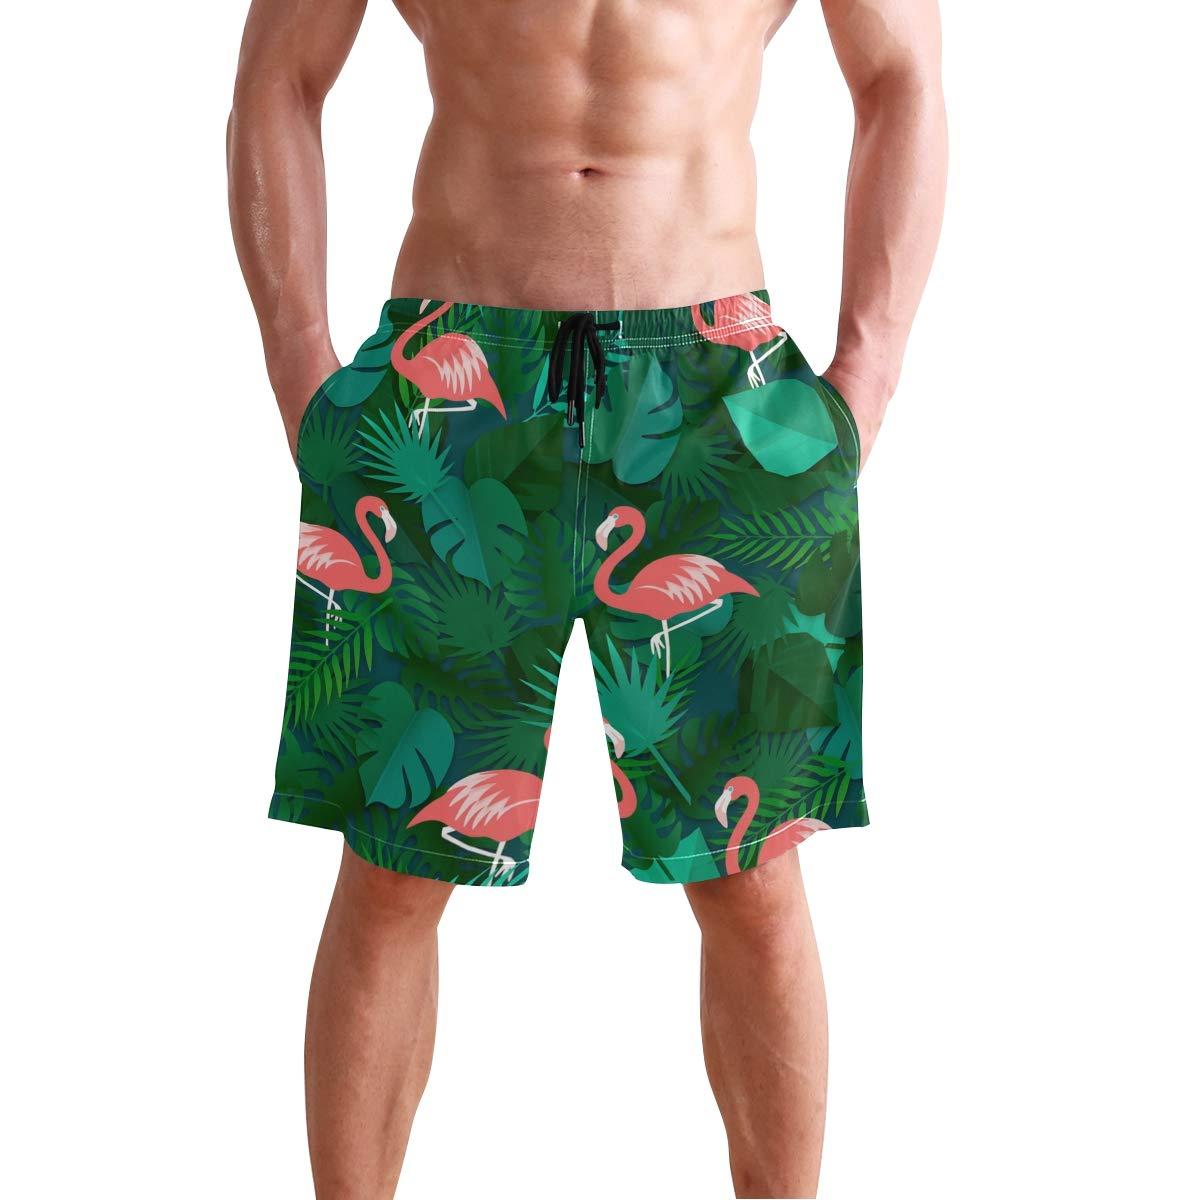 Fashion Flamingo Palm Leaves Shorts Mens Swim Trunks Boardshorts Quick Dry Swimwear with Mesh Lining//Pockets